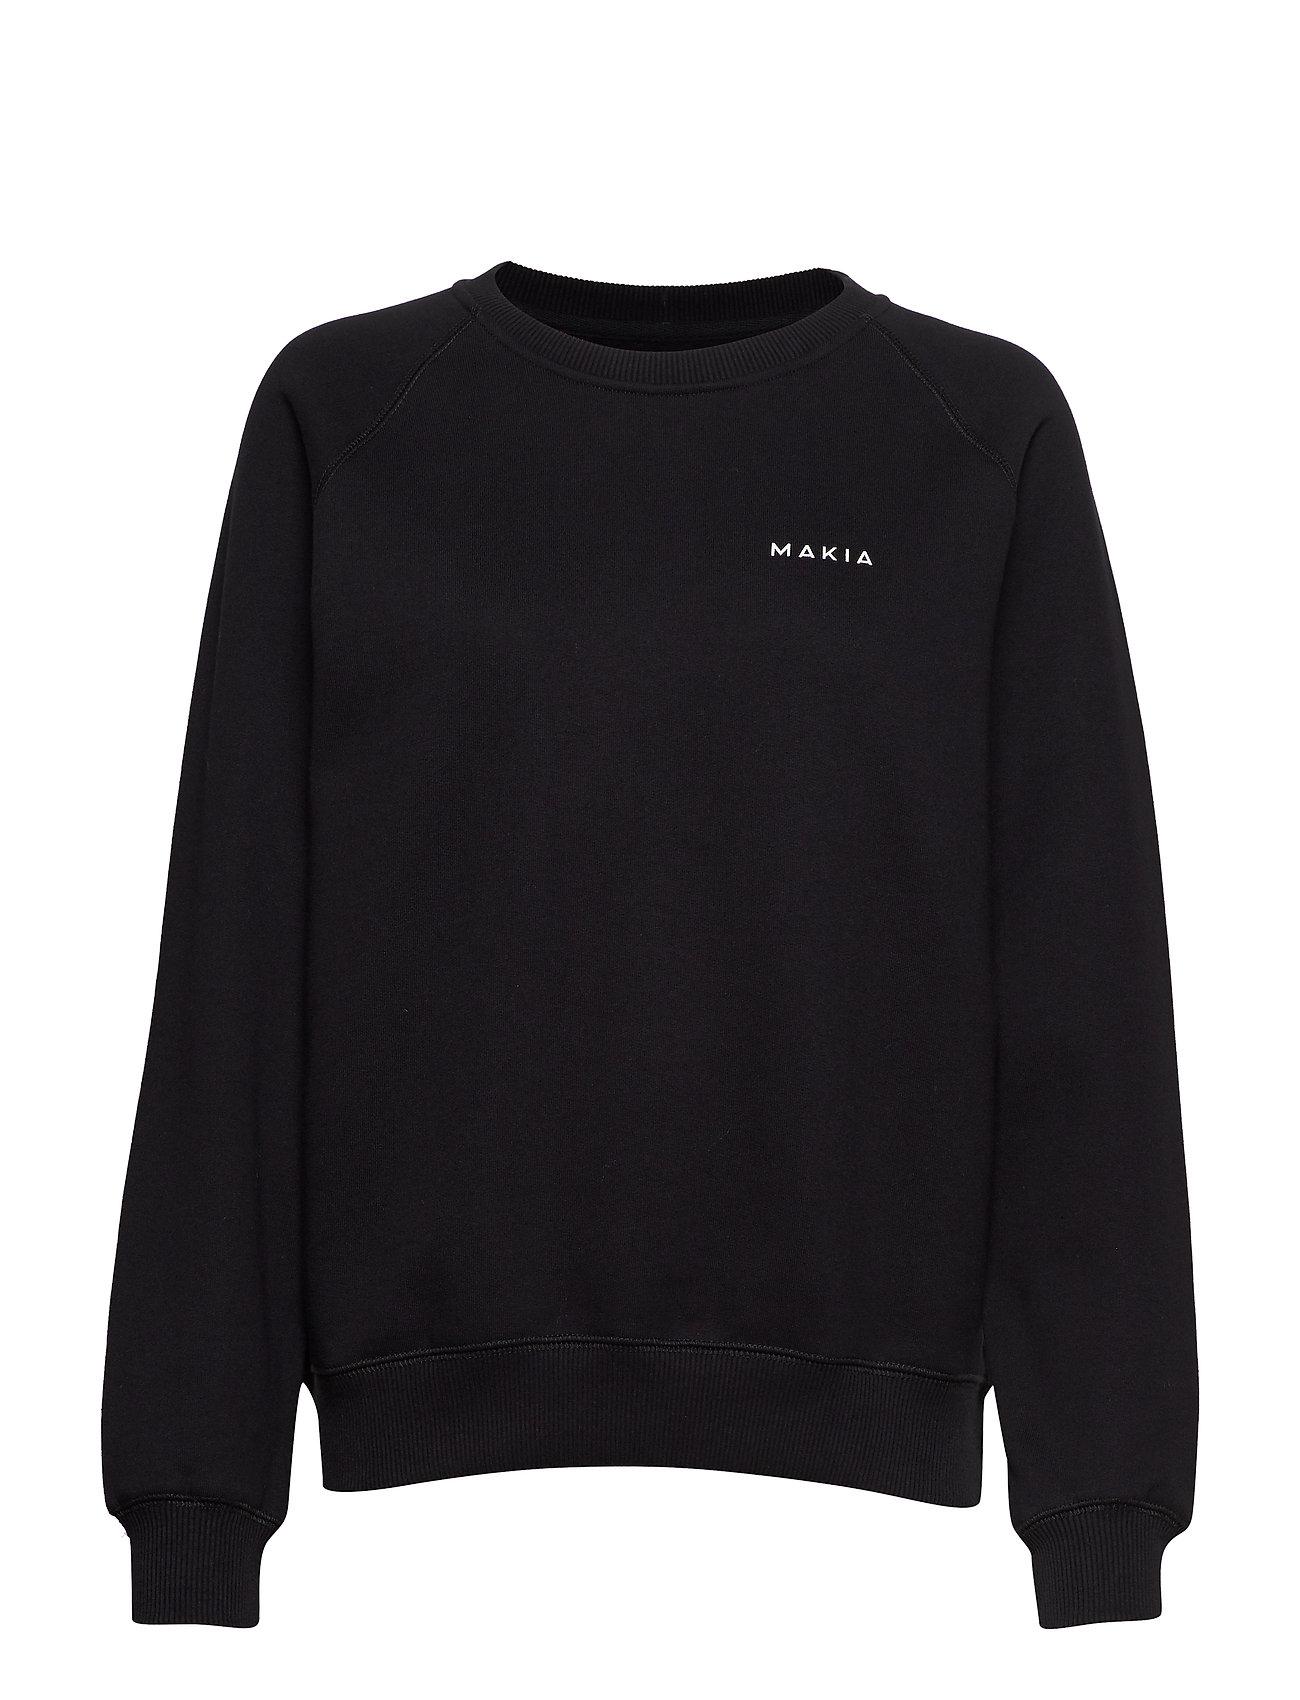 Makia Core Sweatshirt - BLACK